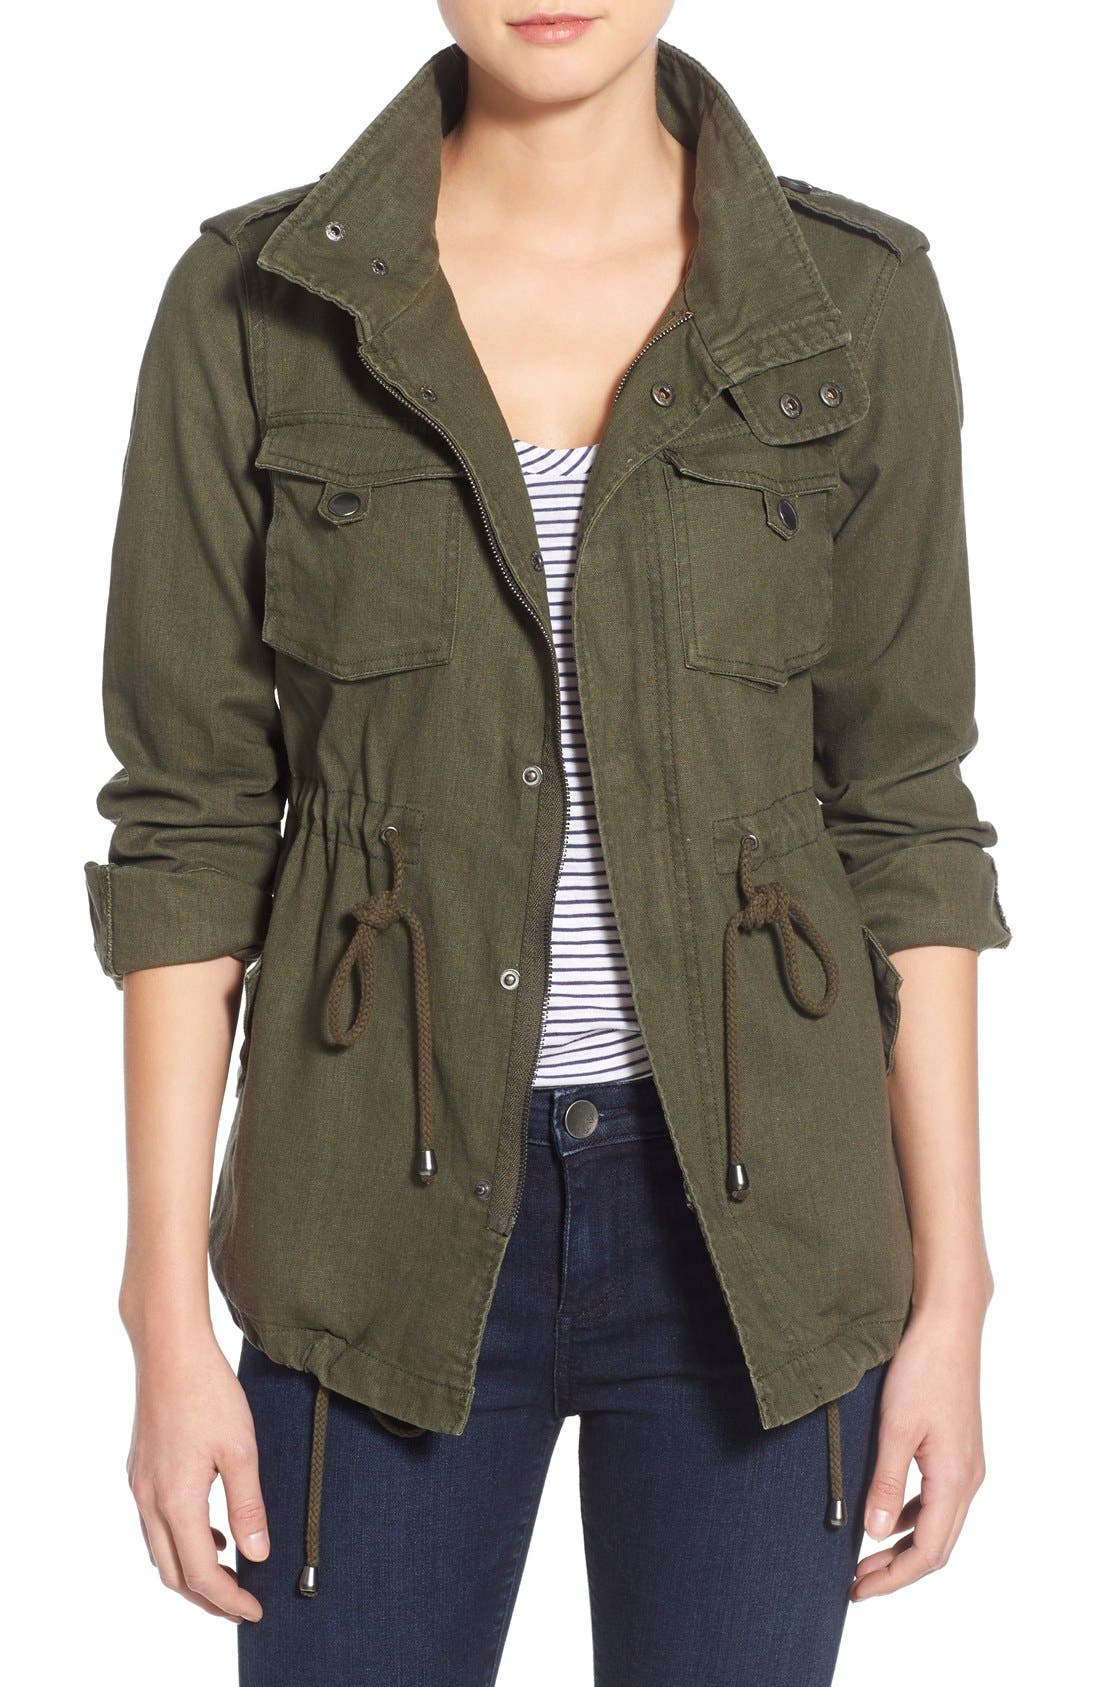 Alternate Image 1 Selected - Pleione Linen & Cotton Blend Military Jacket (Regular & Petite)